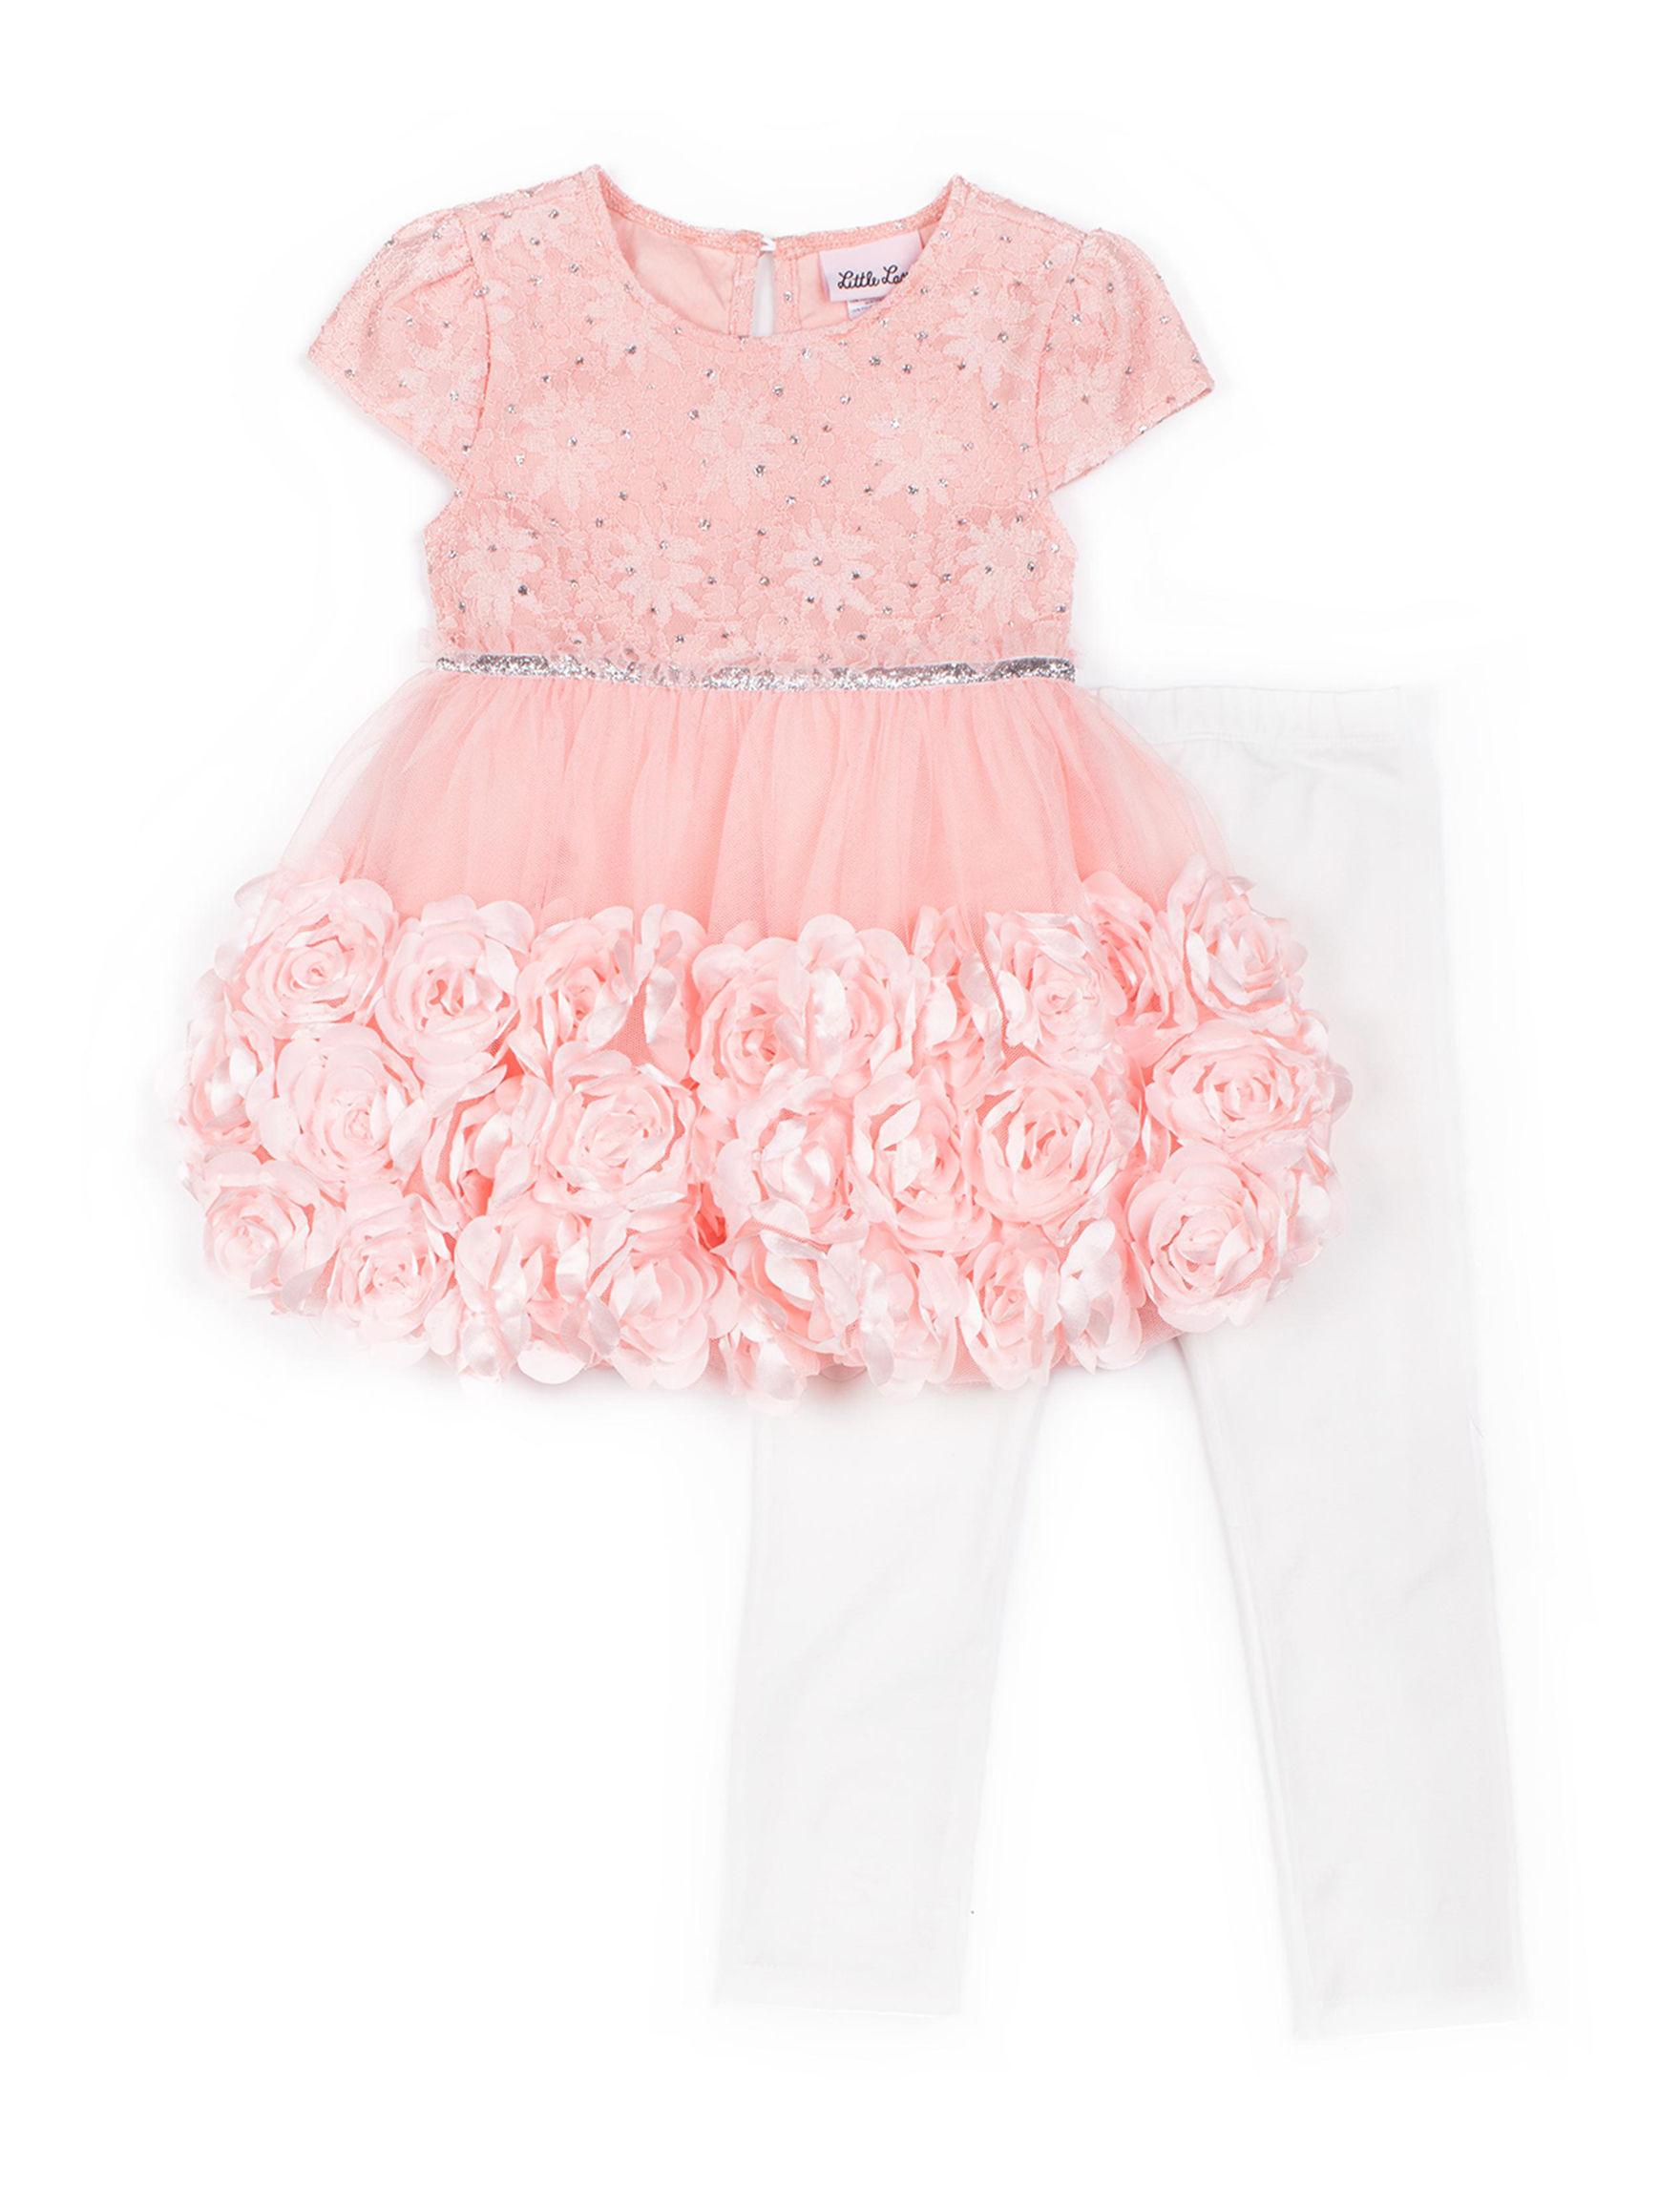 5234499519620 Little Lass 2-pc. Elegant Roses Dress & Leggings Set - Toddlers & Girls  4-6x. WEB ID #:542672. (2). product